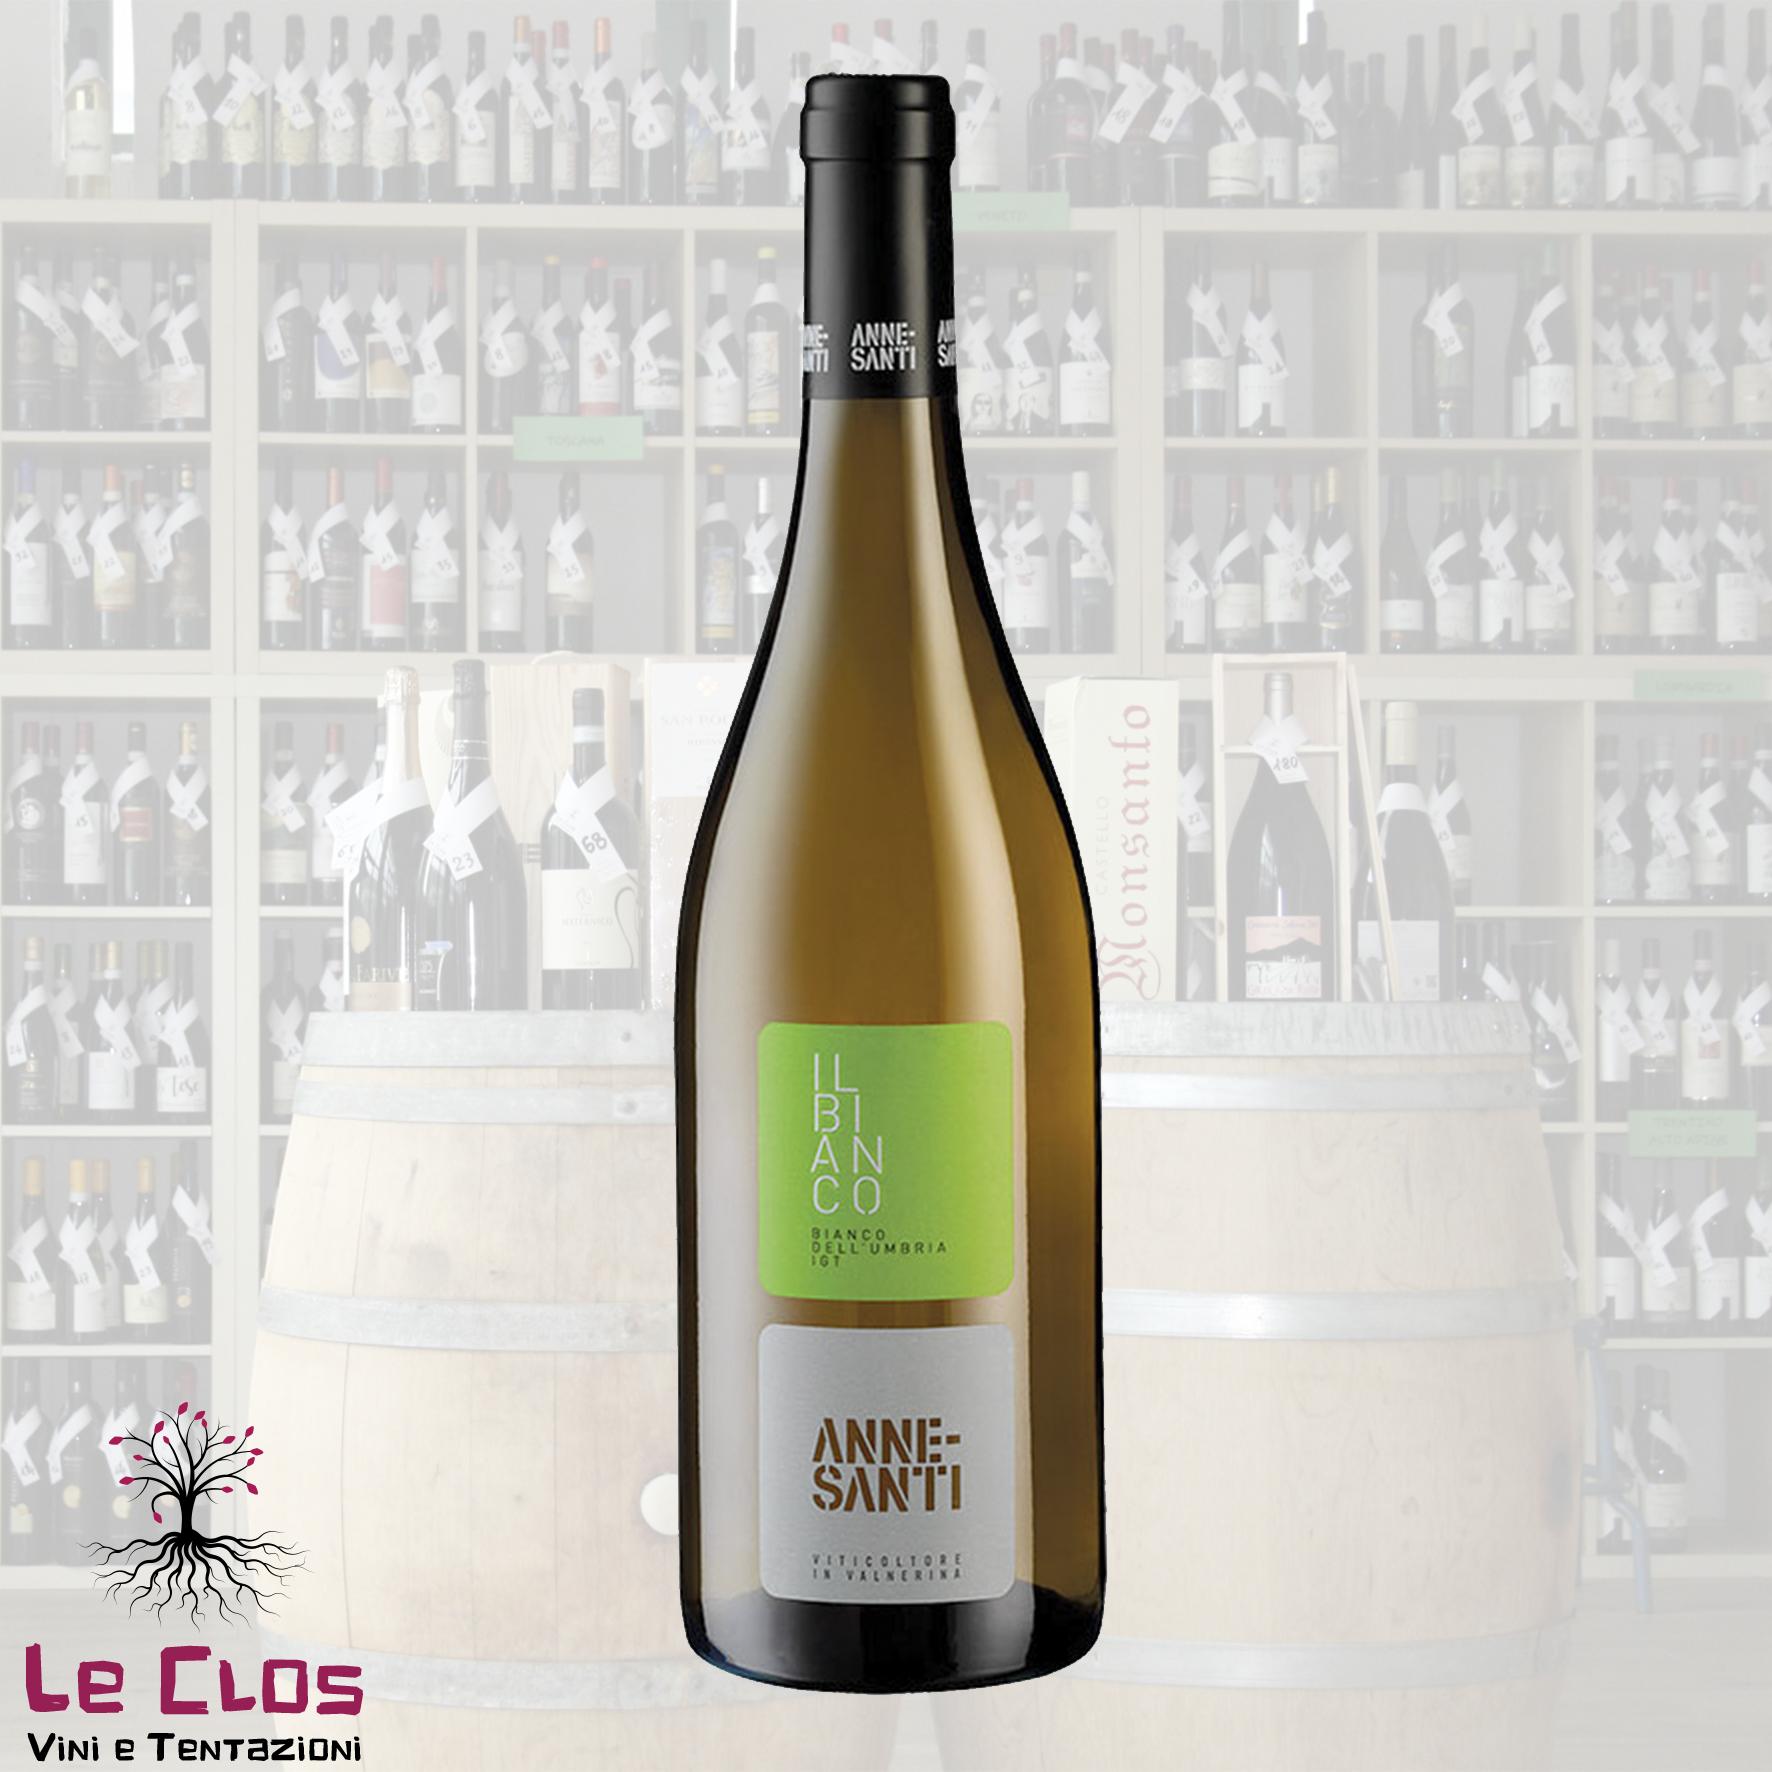 Vino bianco Il Bianco - Bianco dell'Umbria